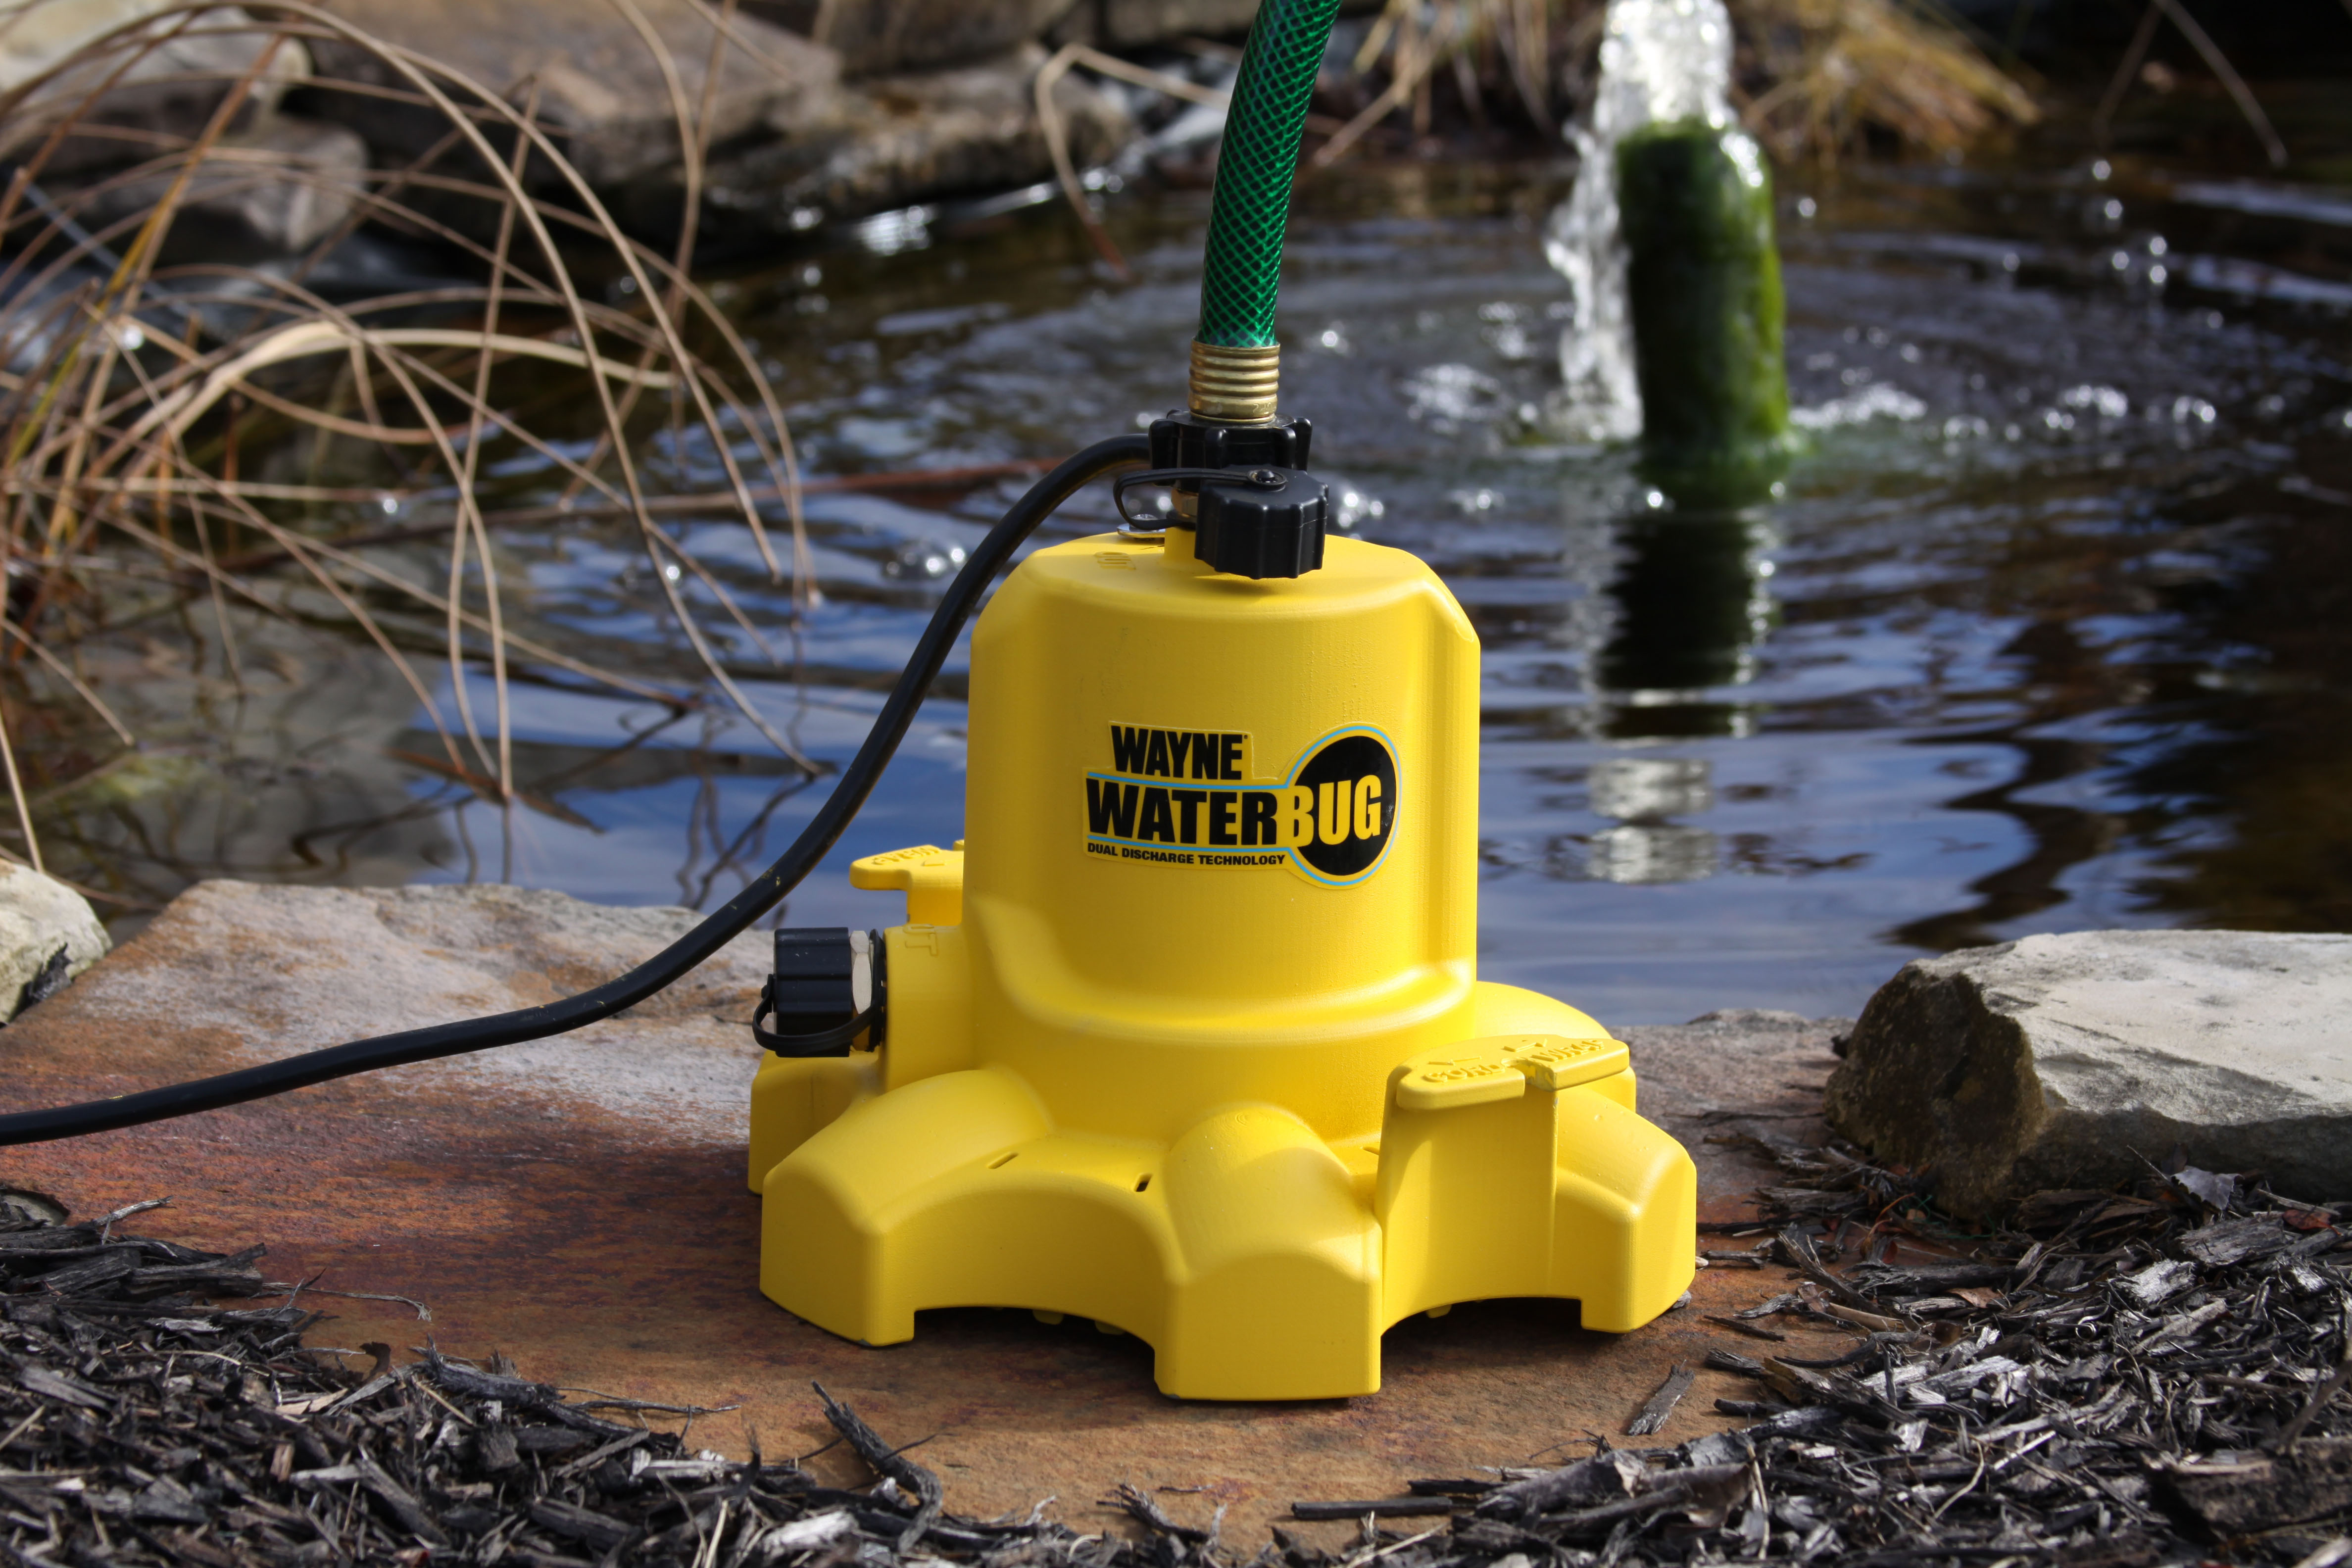 Wayne Pumps Wwb Waterbug Submersible Pump For Removing